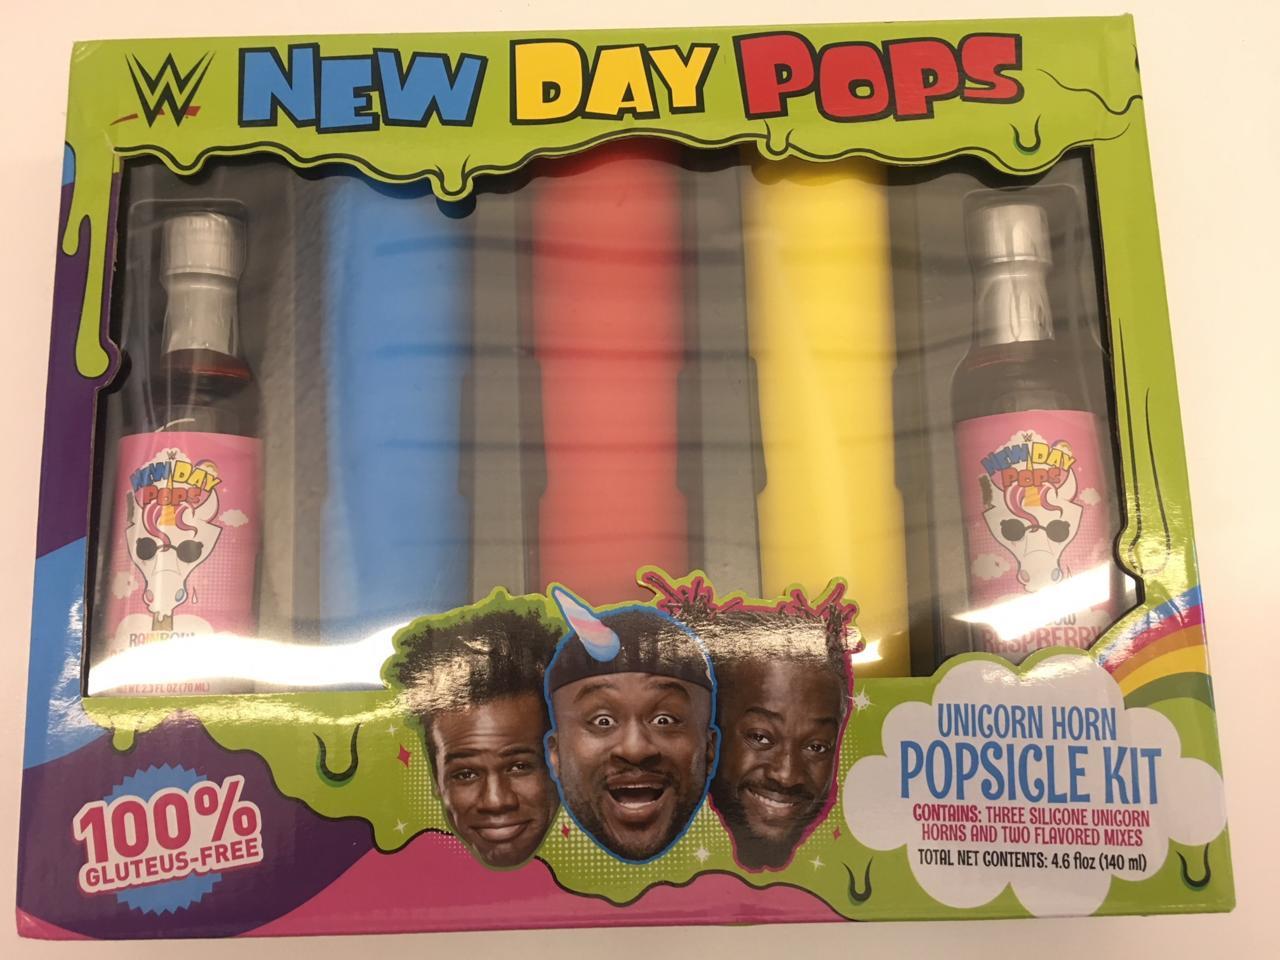 4. New Day Pops